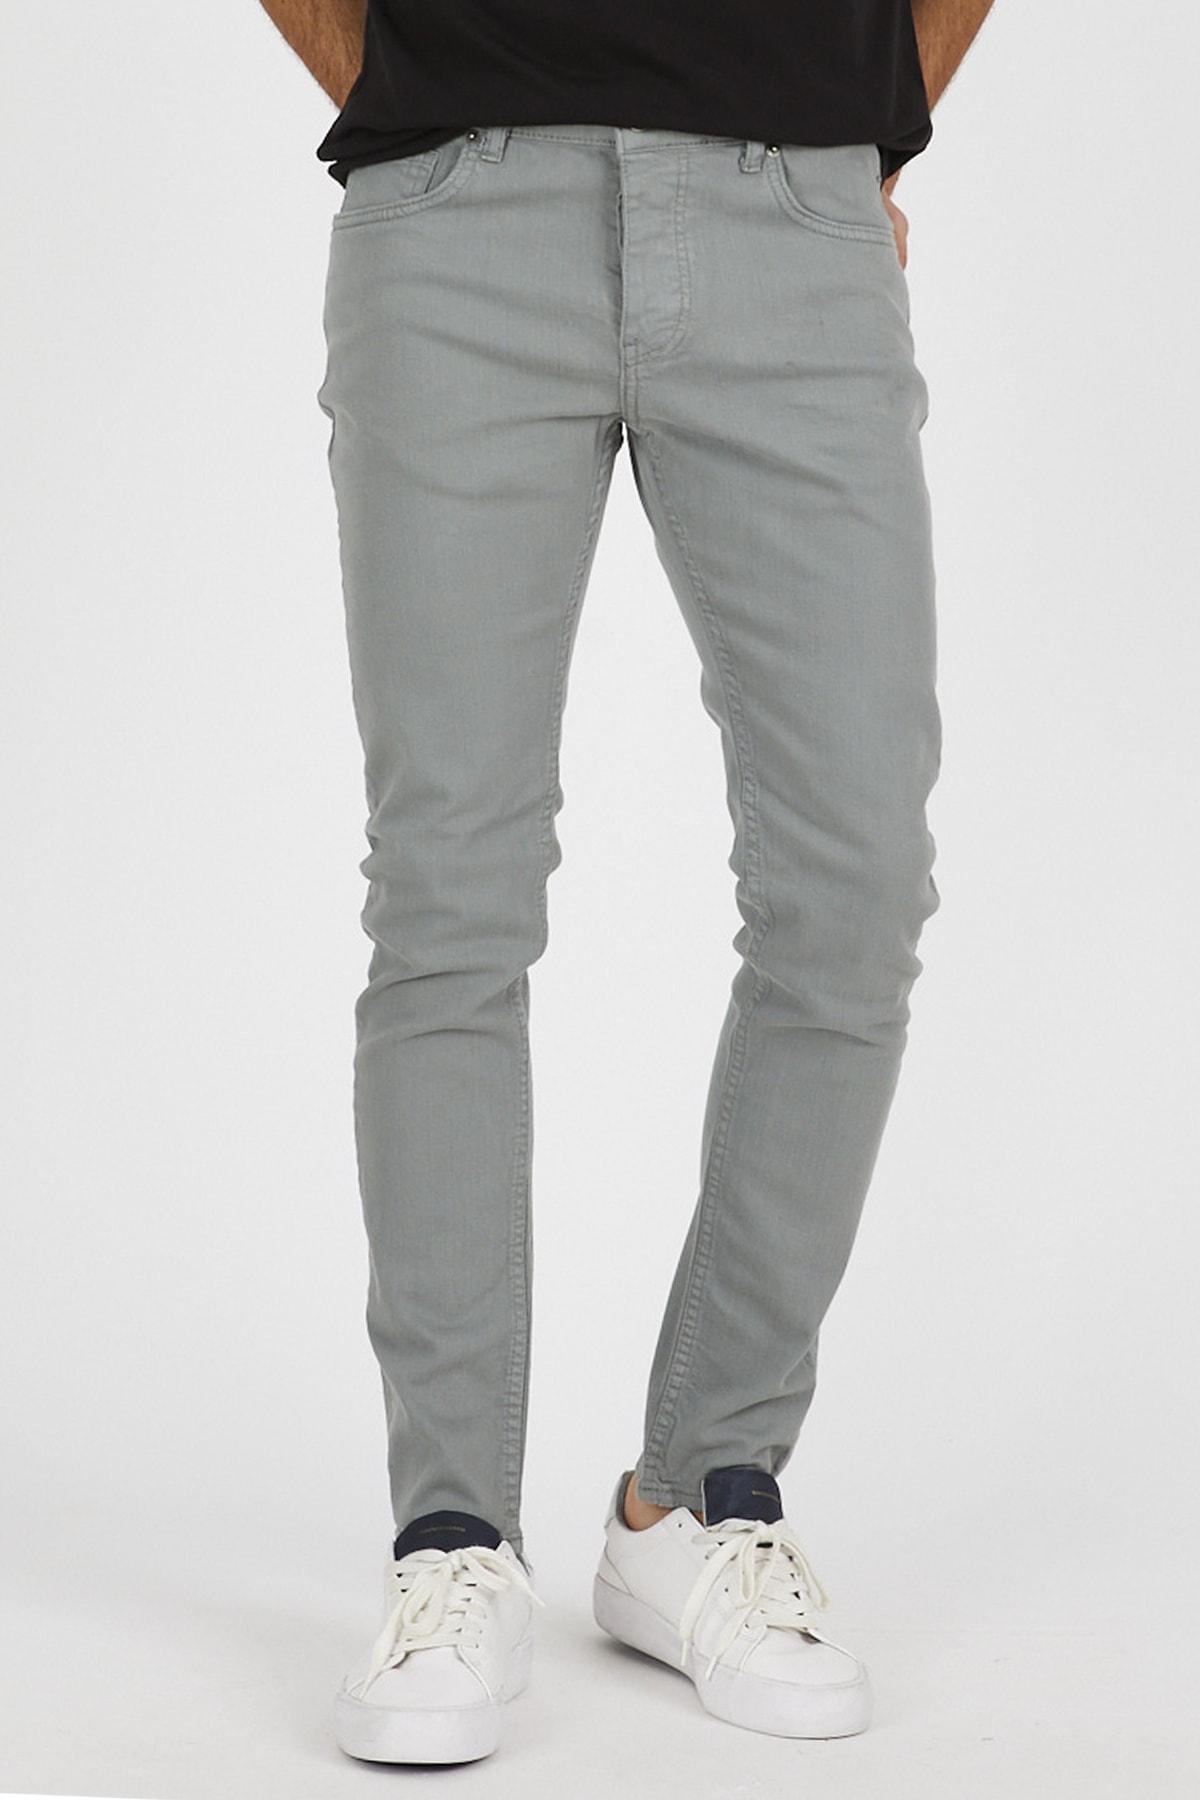 Denim Republic Erkek Mint Slim Fit Pantolon 1